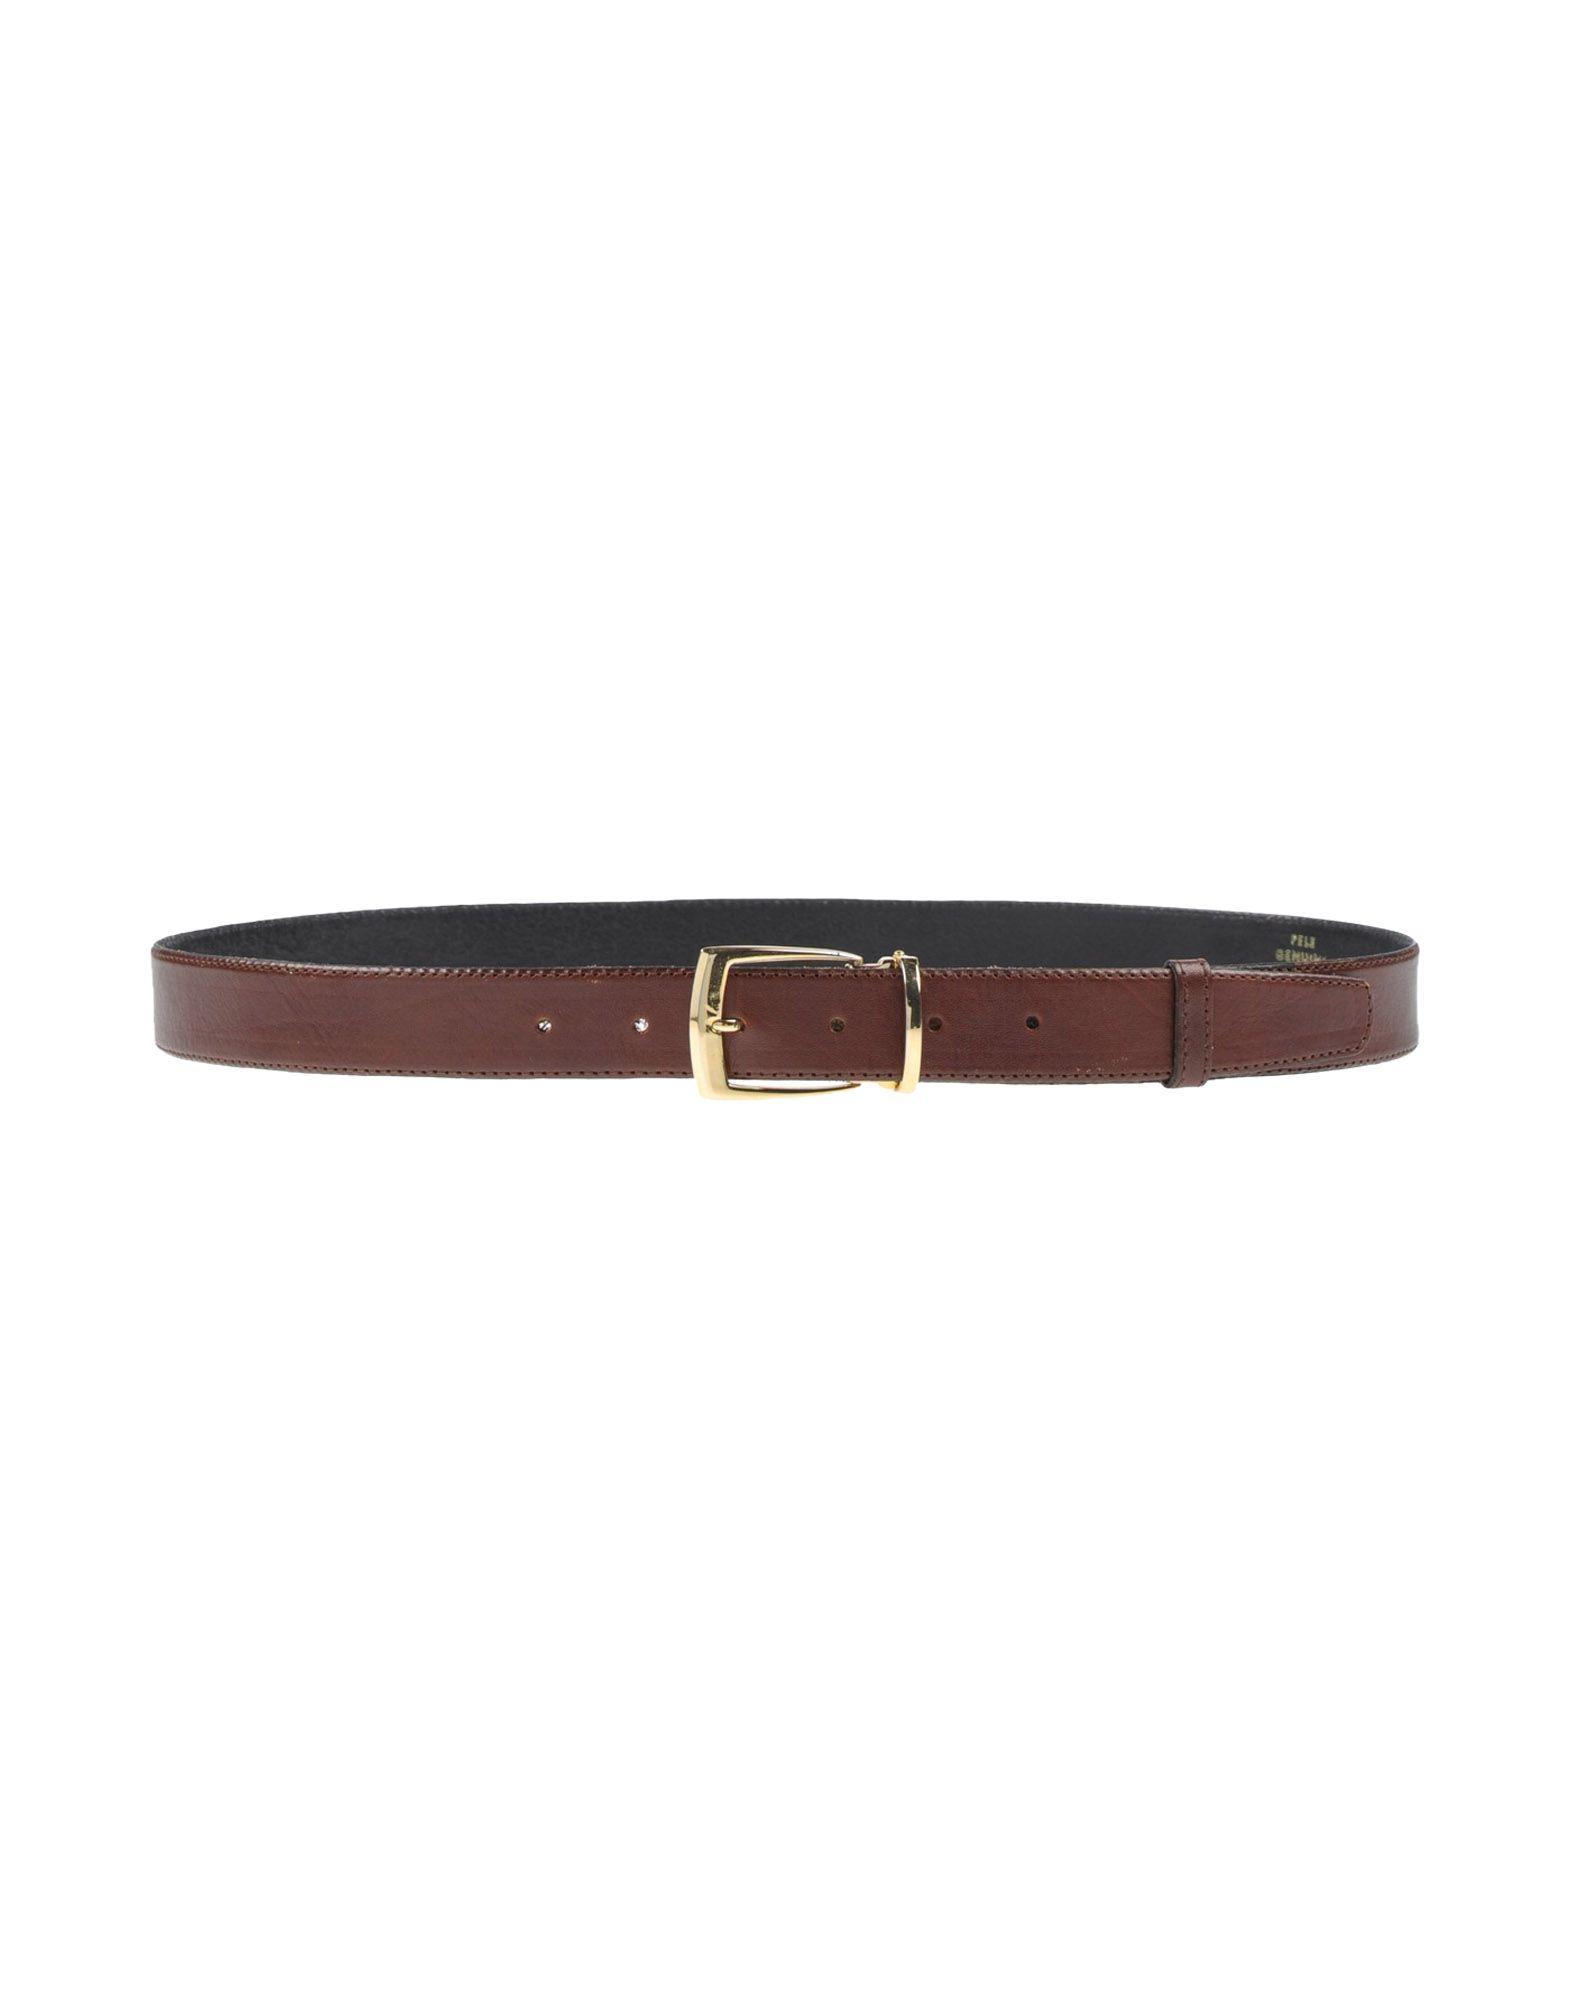 MAISON SCOTCH Belts